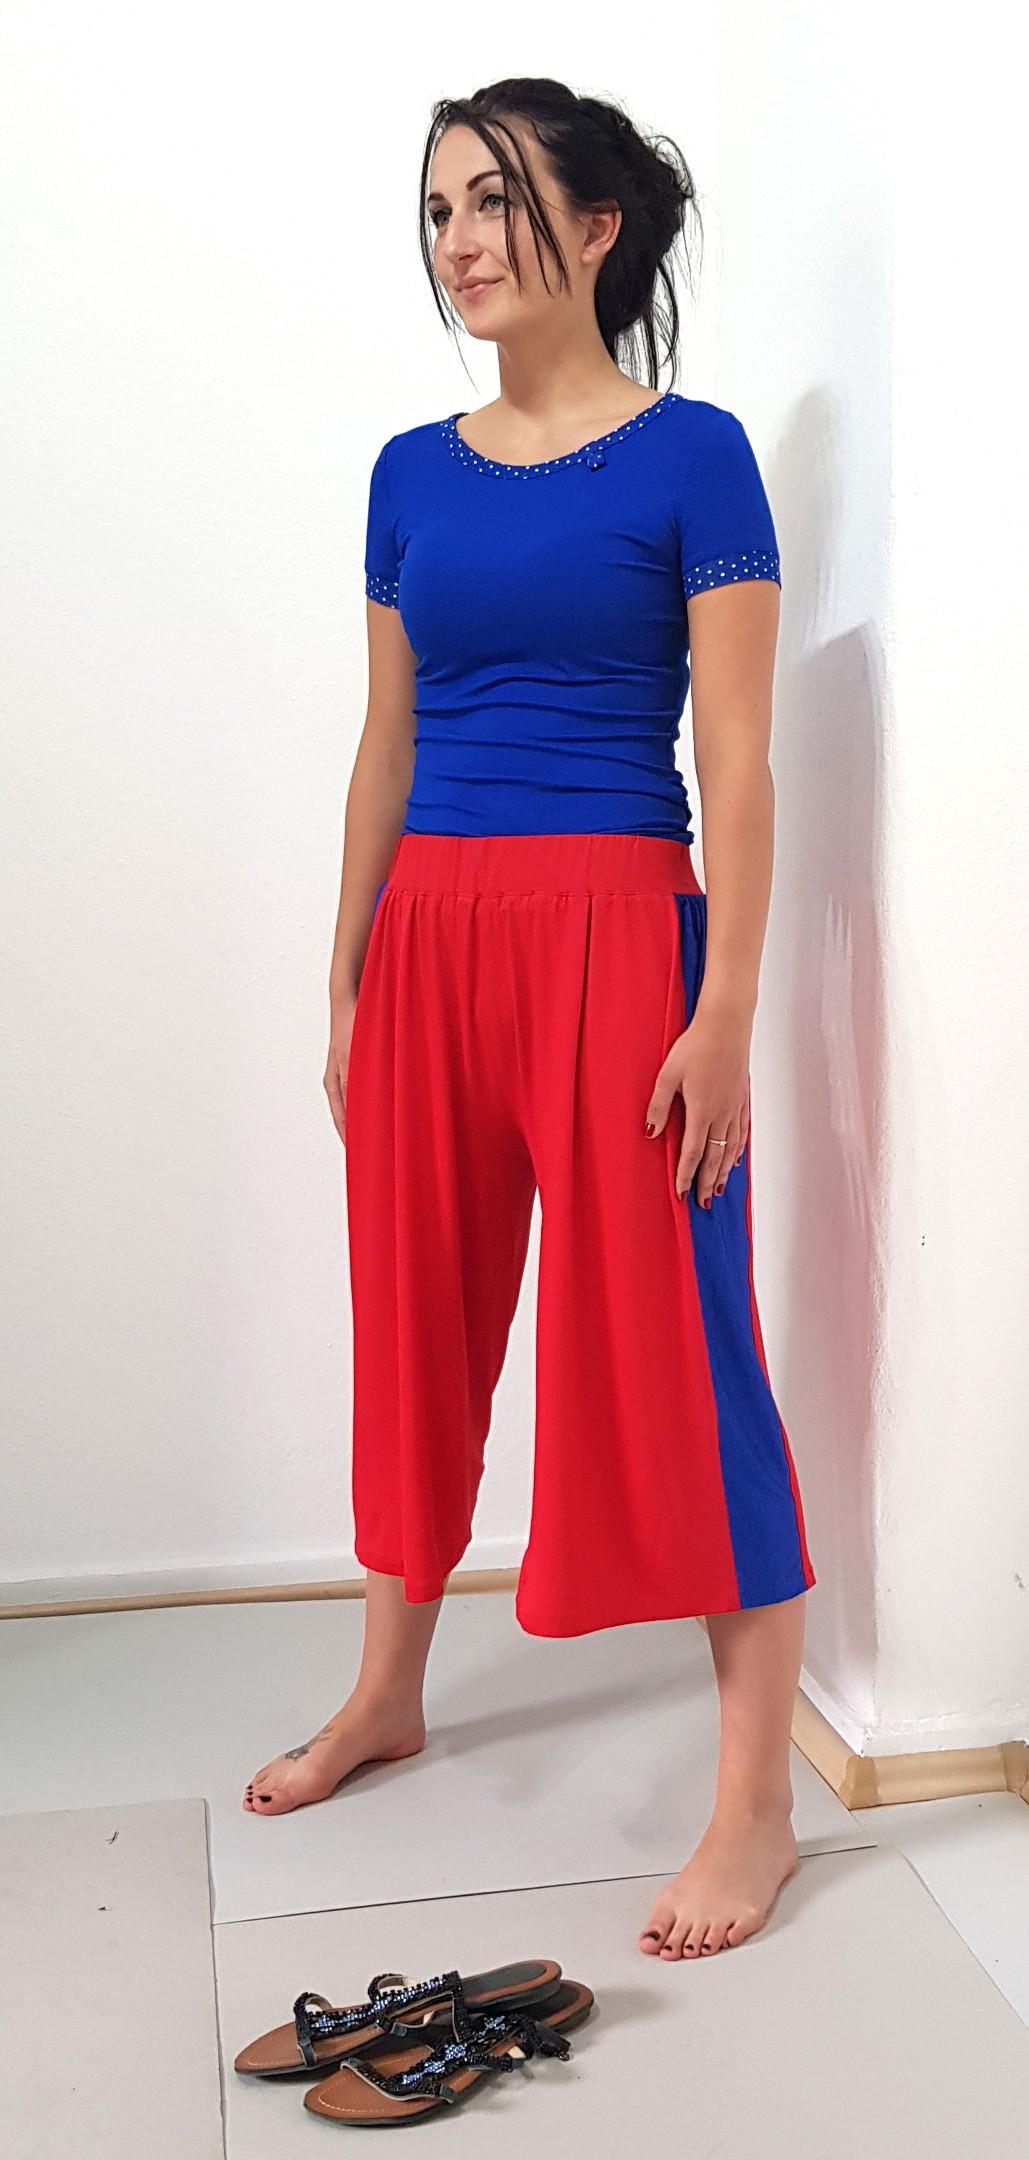 Unsere Model ist 168 cm. Groß, trägt Kleidergröße 36.....Our model is 168 cm. Large, wears a size 36.